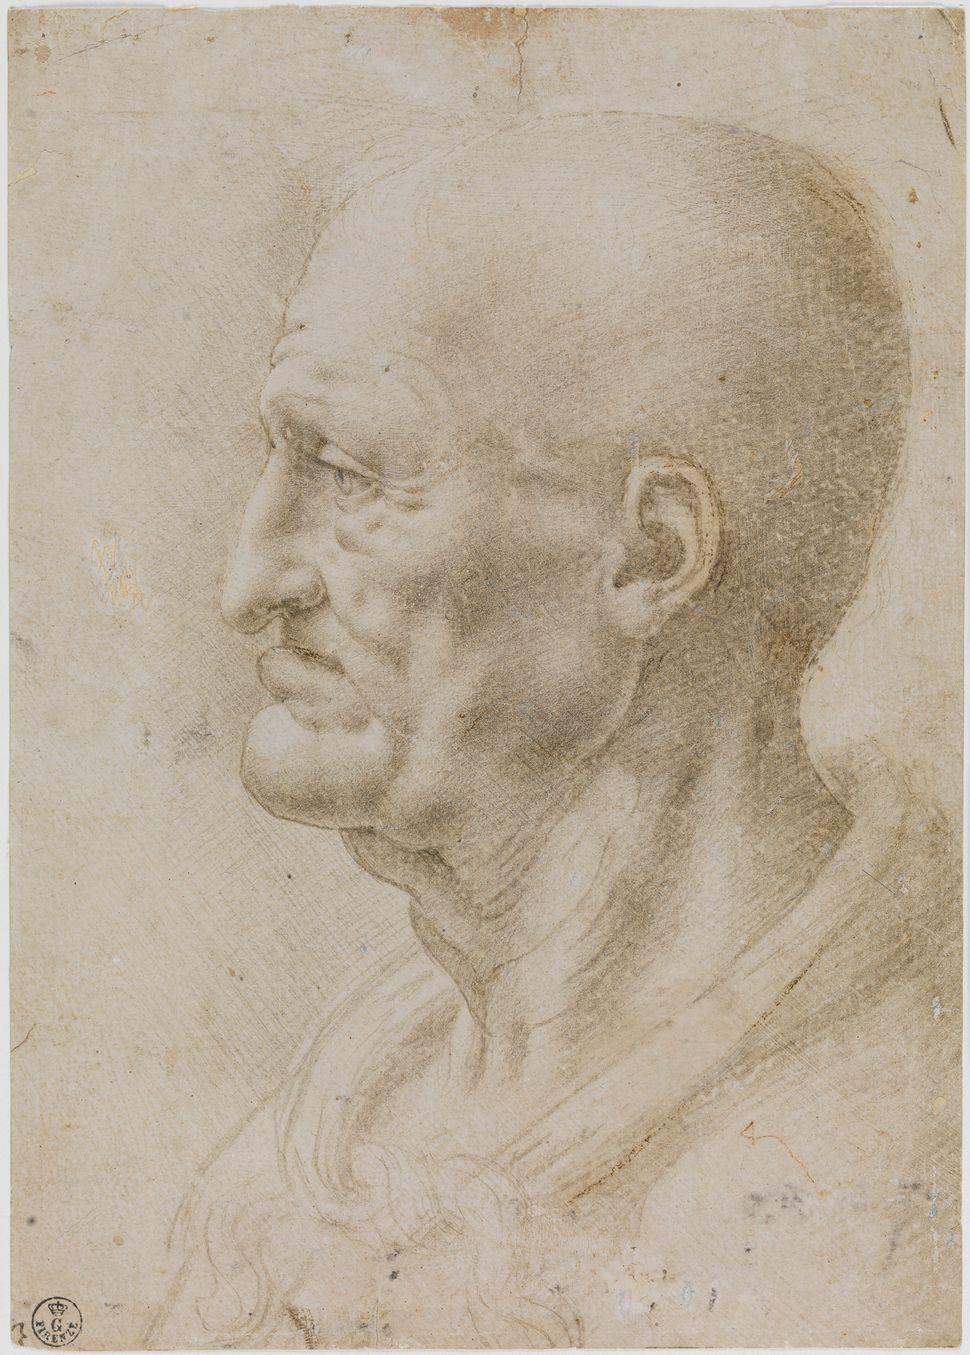 """Head of an Old Man,"" 1490s, Leonardo da Vinci and assistant."